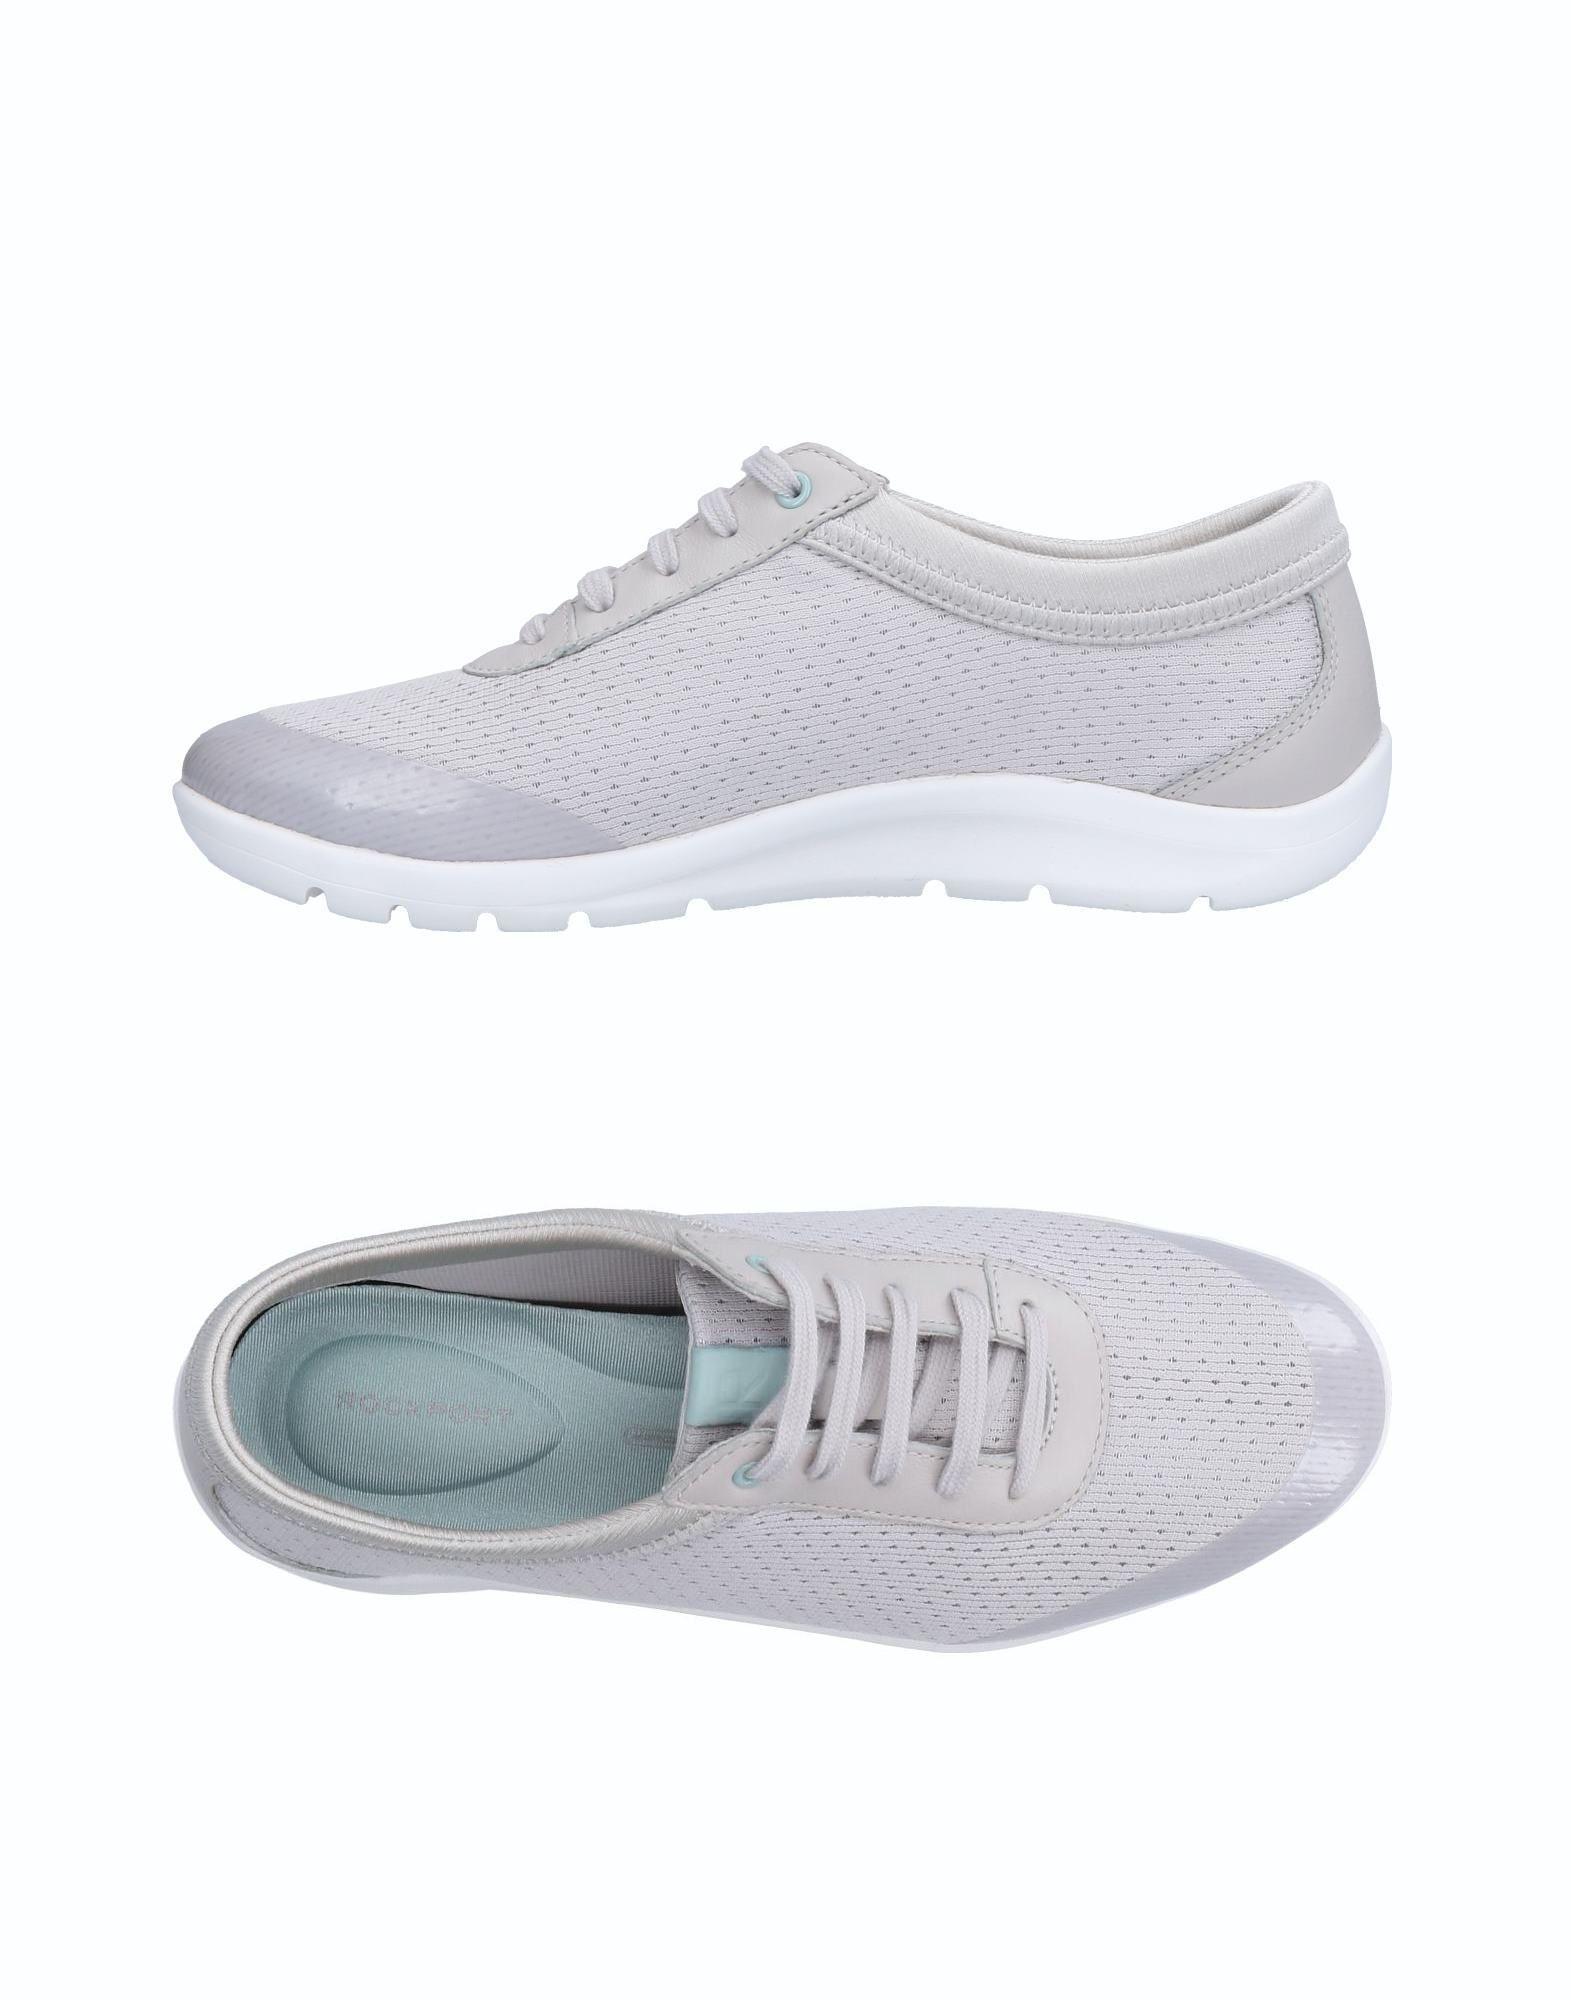 Rockport Sneakers Damen  11509301IK Gute Qualität beliebte Schuhe